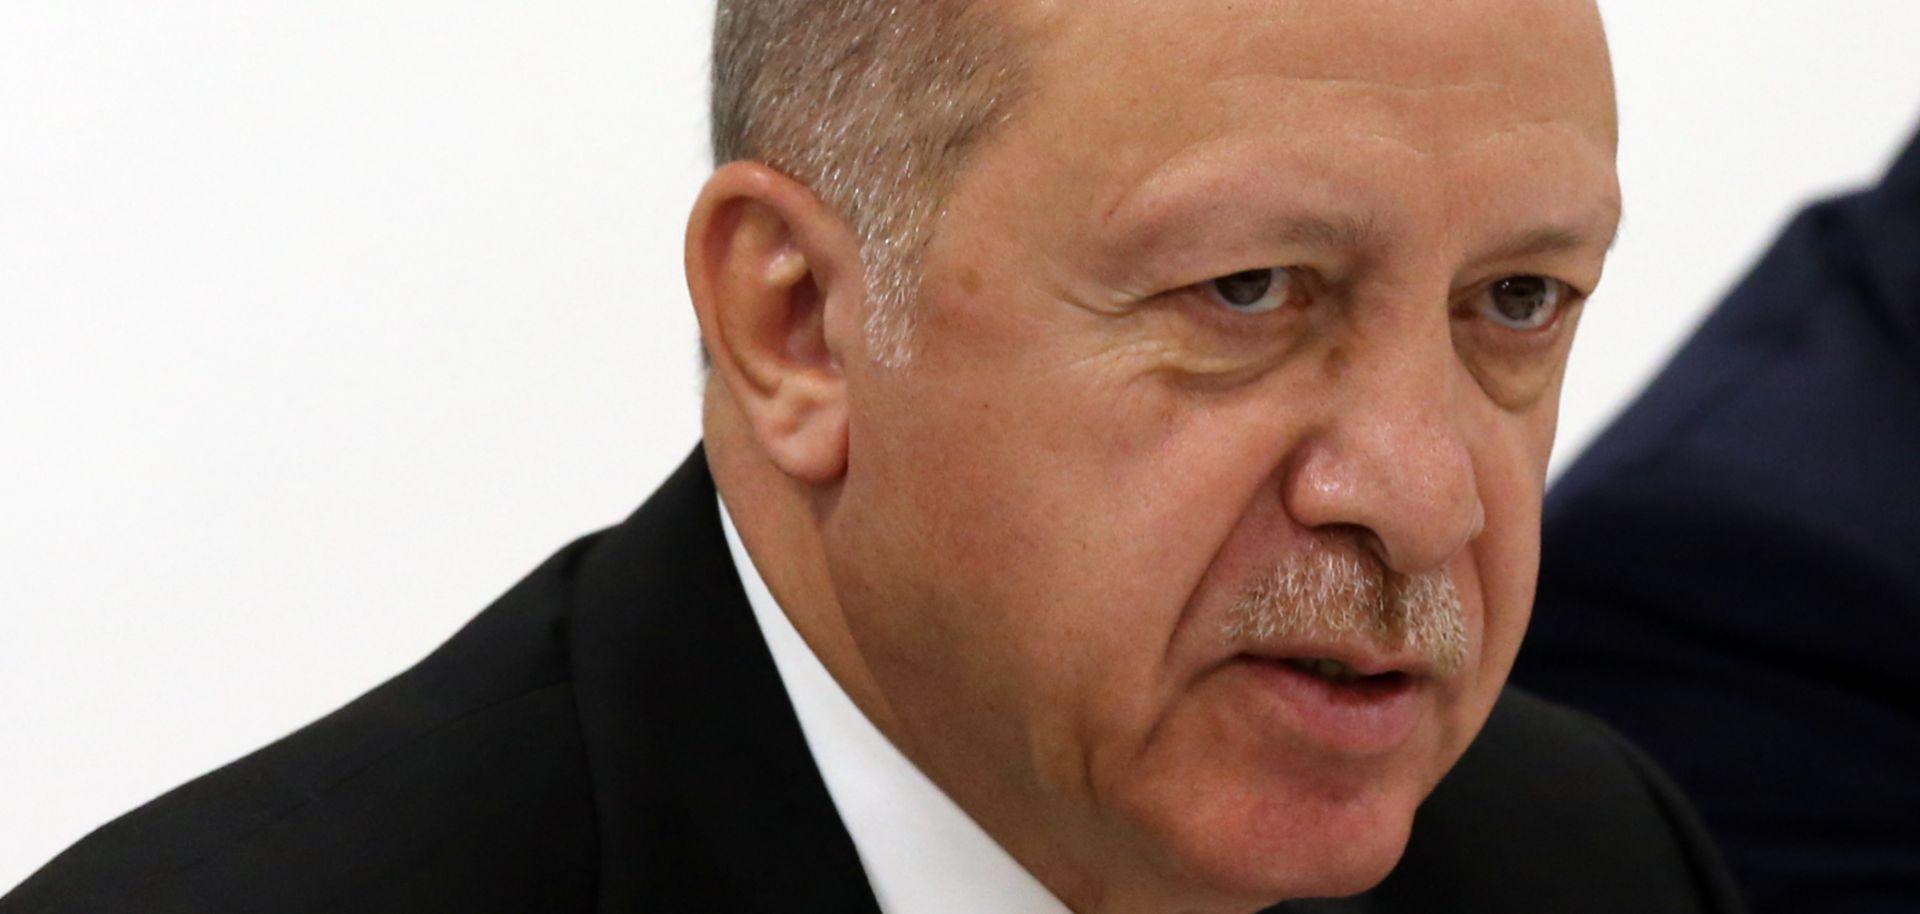 Turkish President Recep Tayyip Erdogan speaks during a meeting at the G-20 summit in Osaka, Japan, on June 29, 2019.